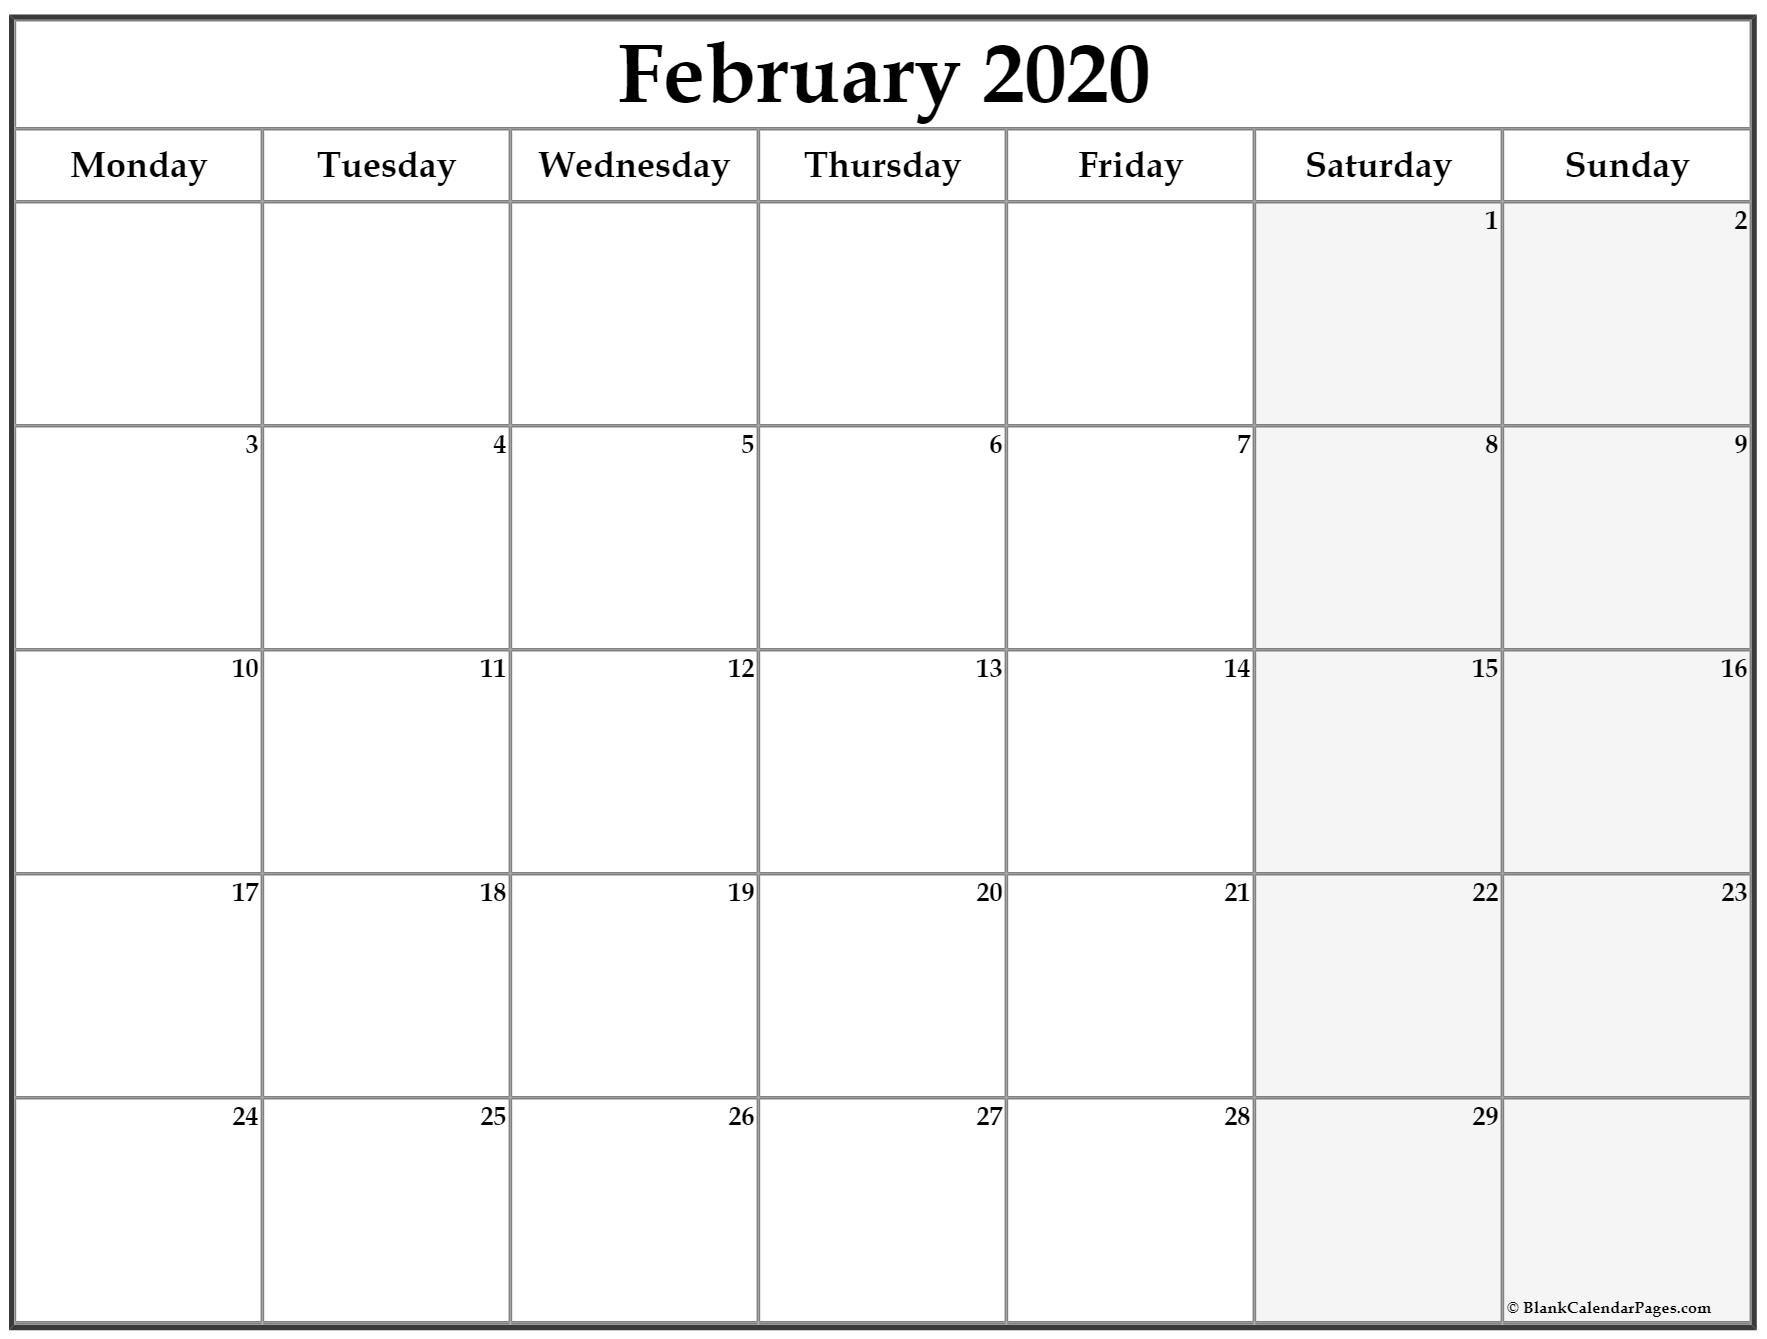 February 2020 Monday Calendar   Monday To Sunday Calendar Saturday To Friday